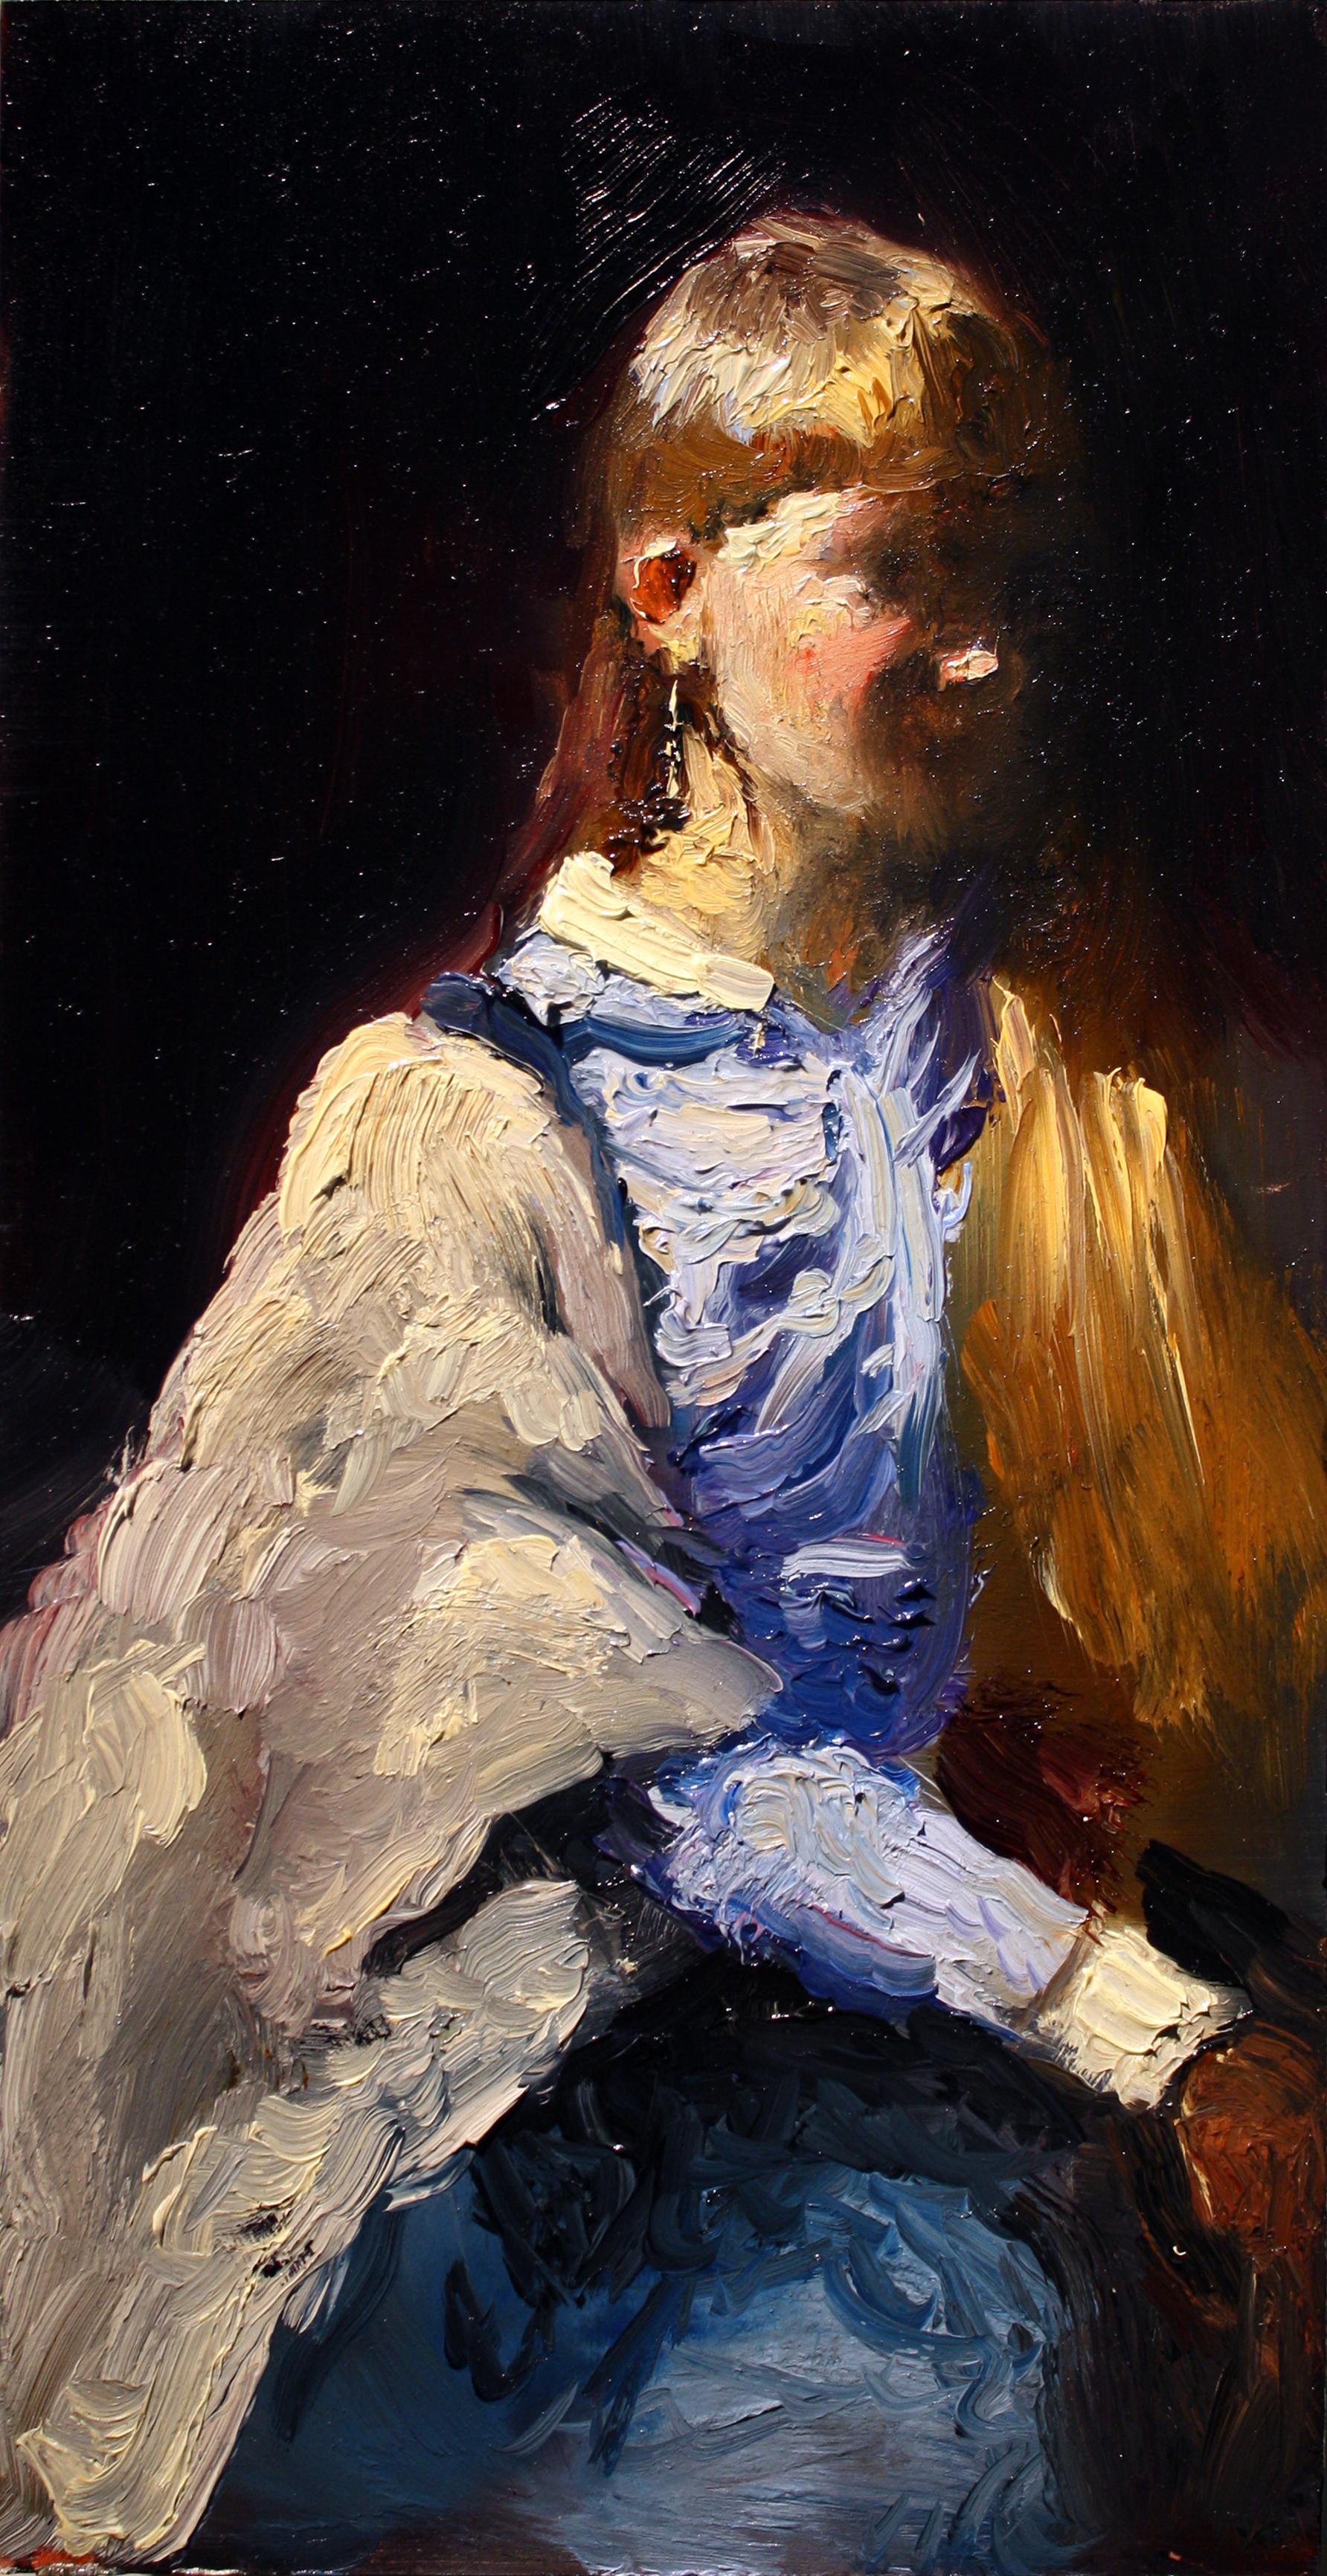 "Julia, oil on wood panel, 12"" x 6"" x 1"", 2016 (sold)"